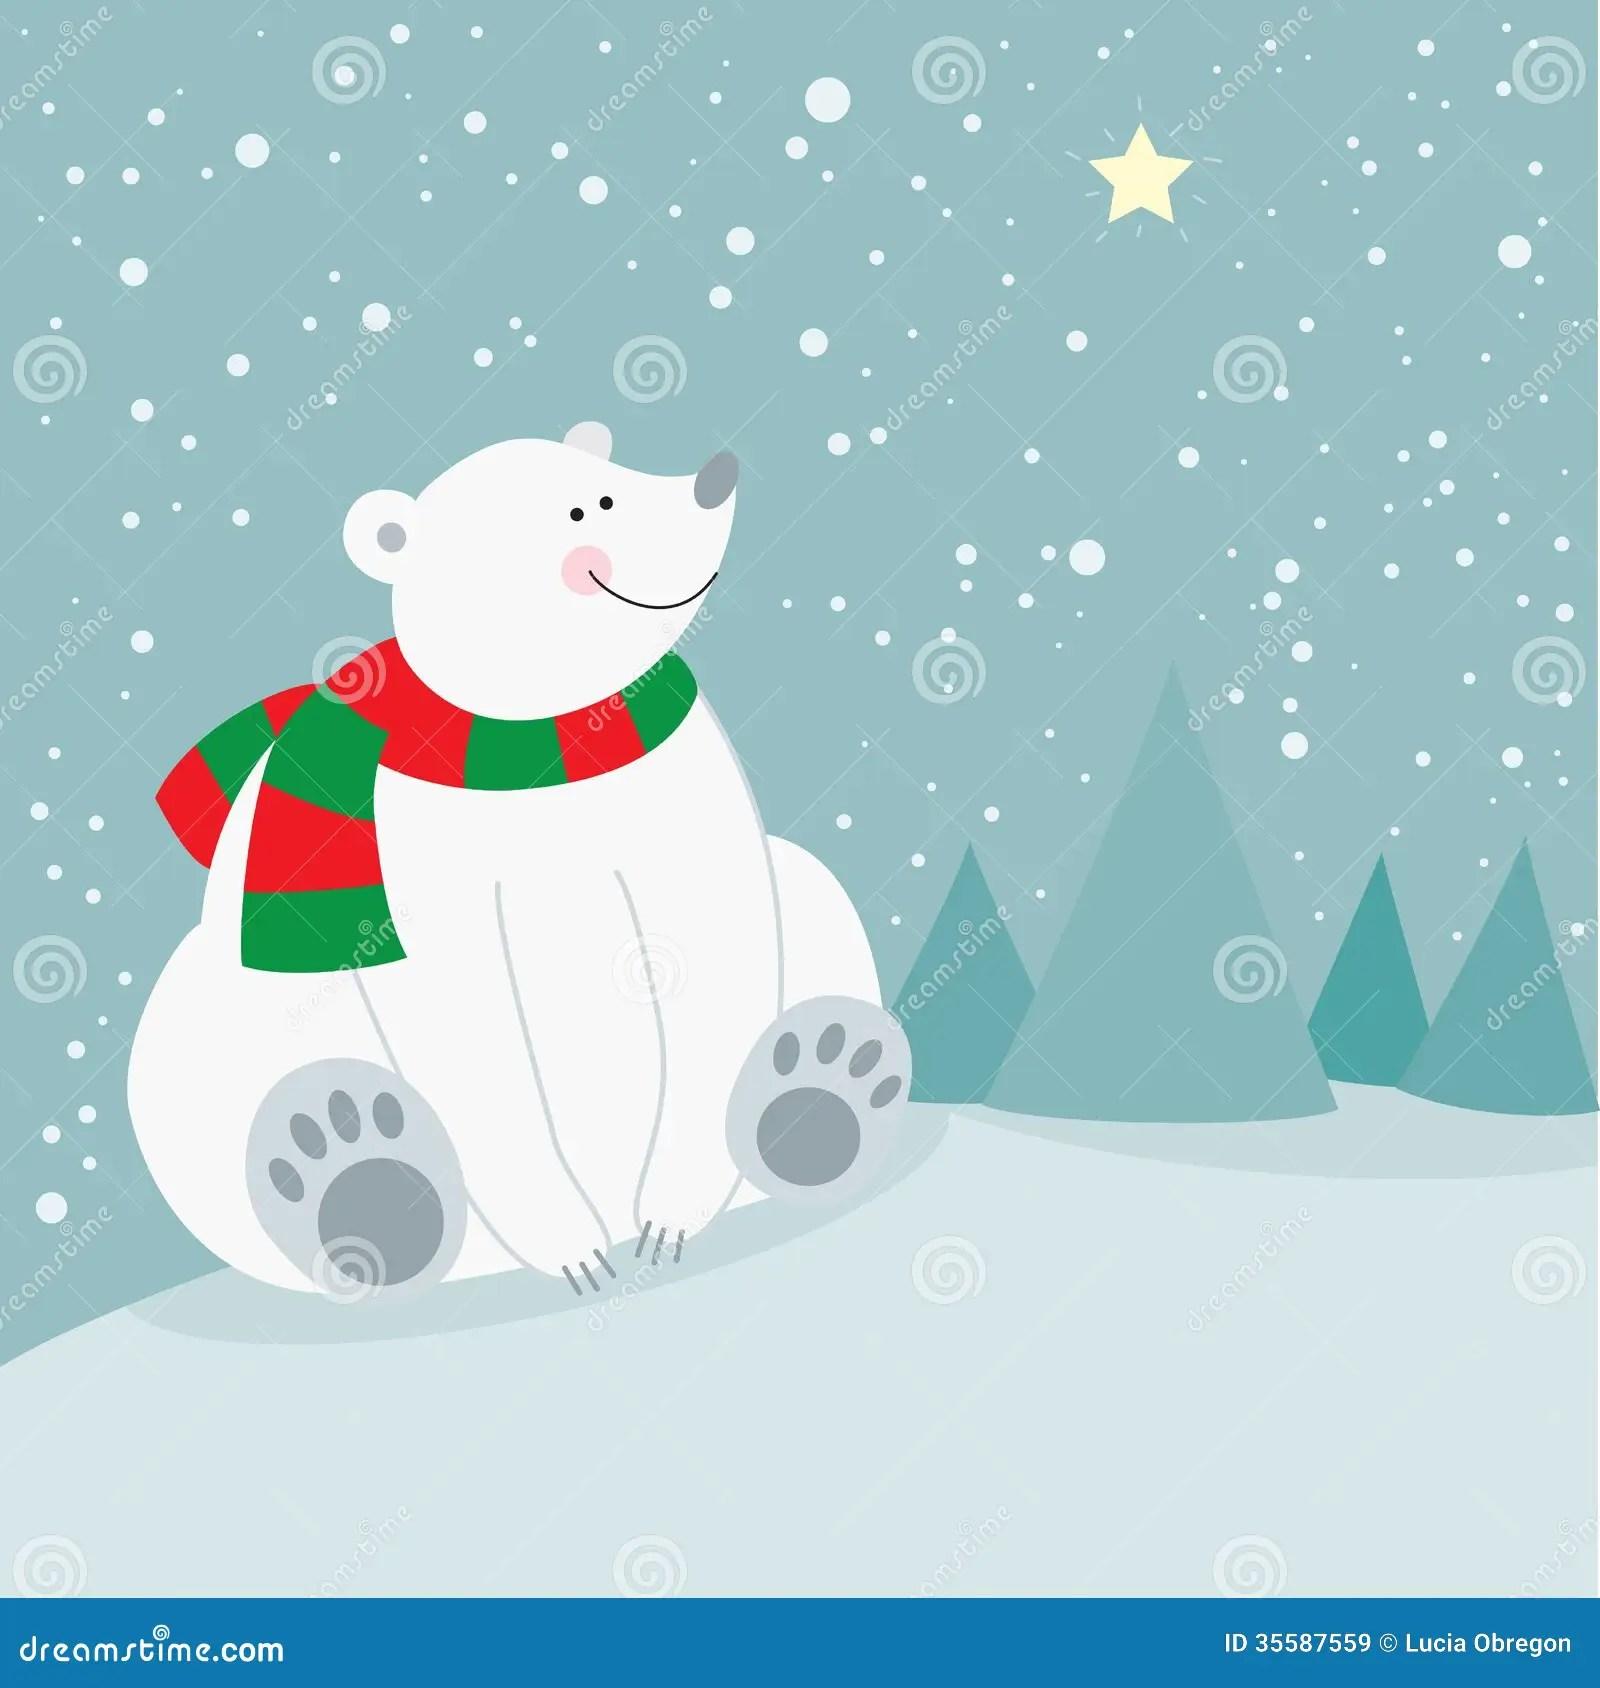 Cute Penguin Wallpaper Cartoon Cute Christmas Holiday Polar Bear Stock Illustration